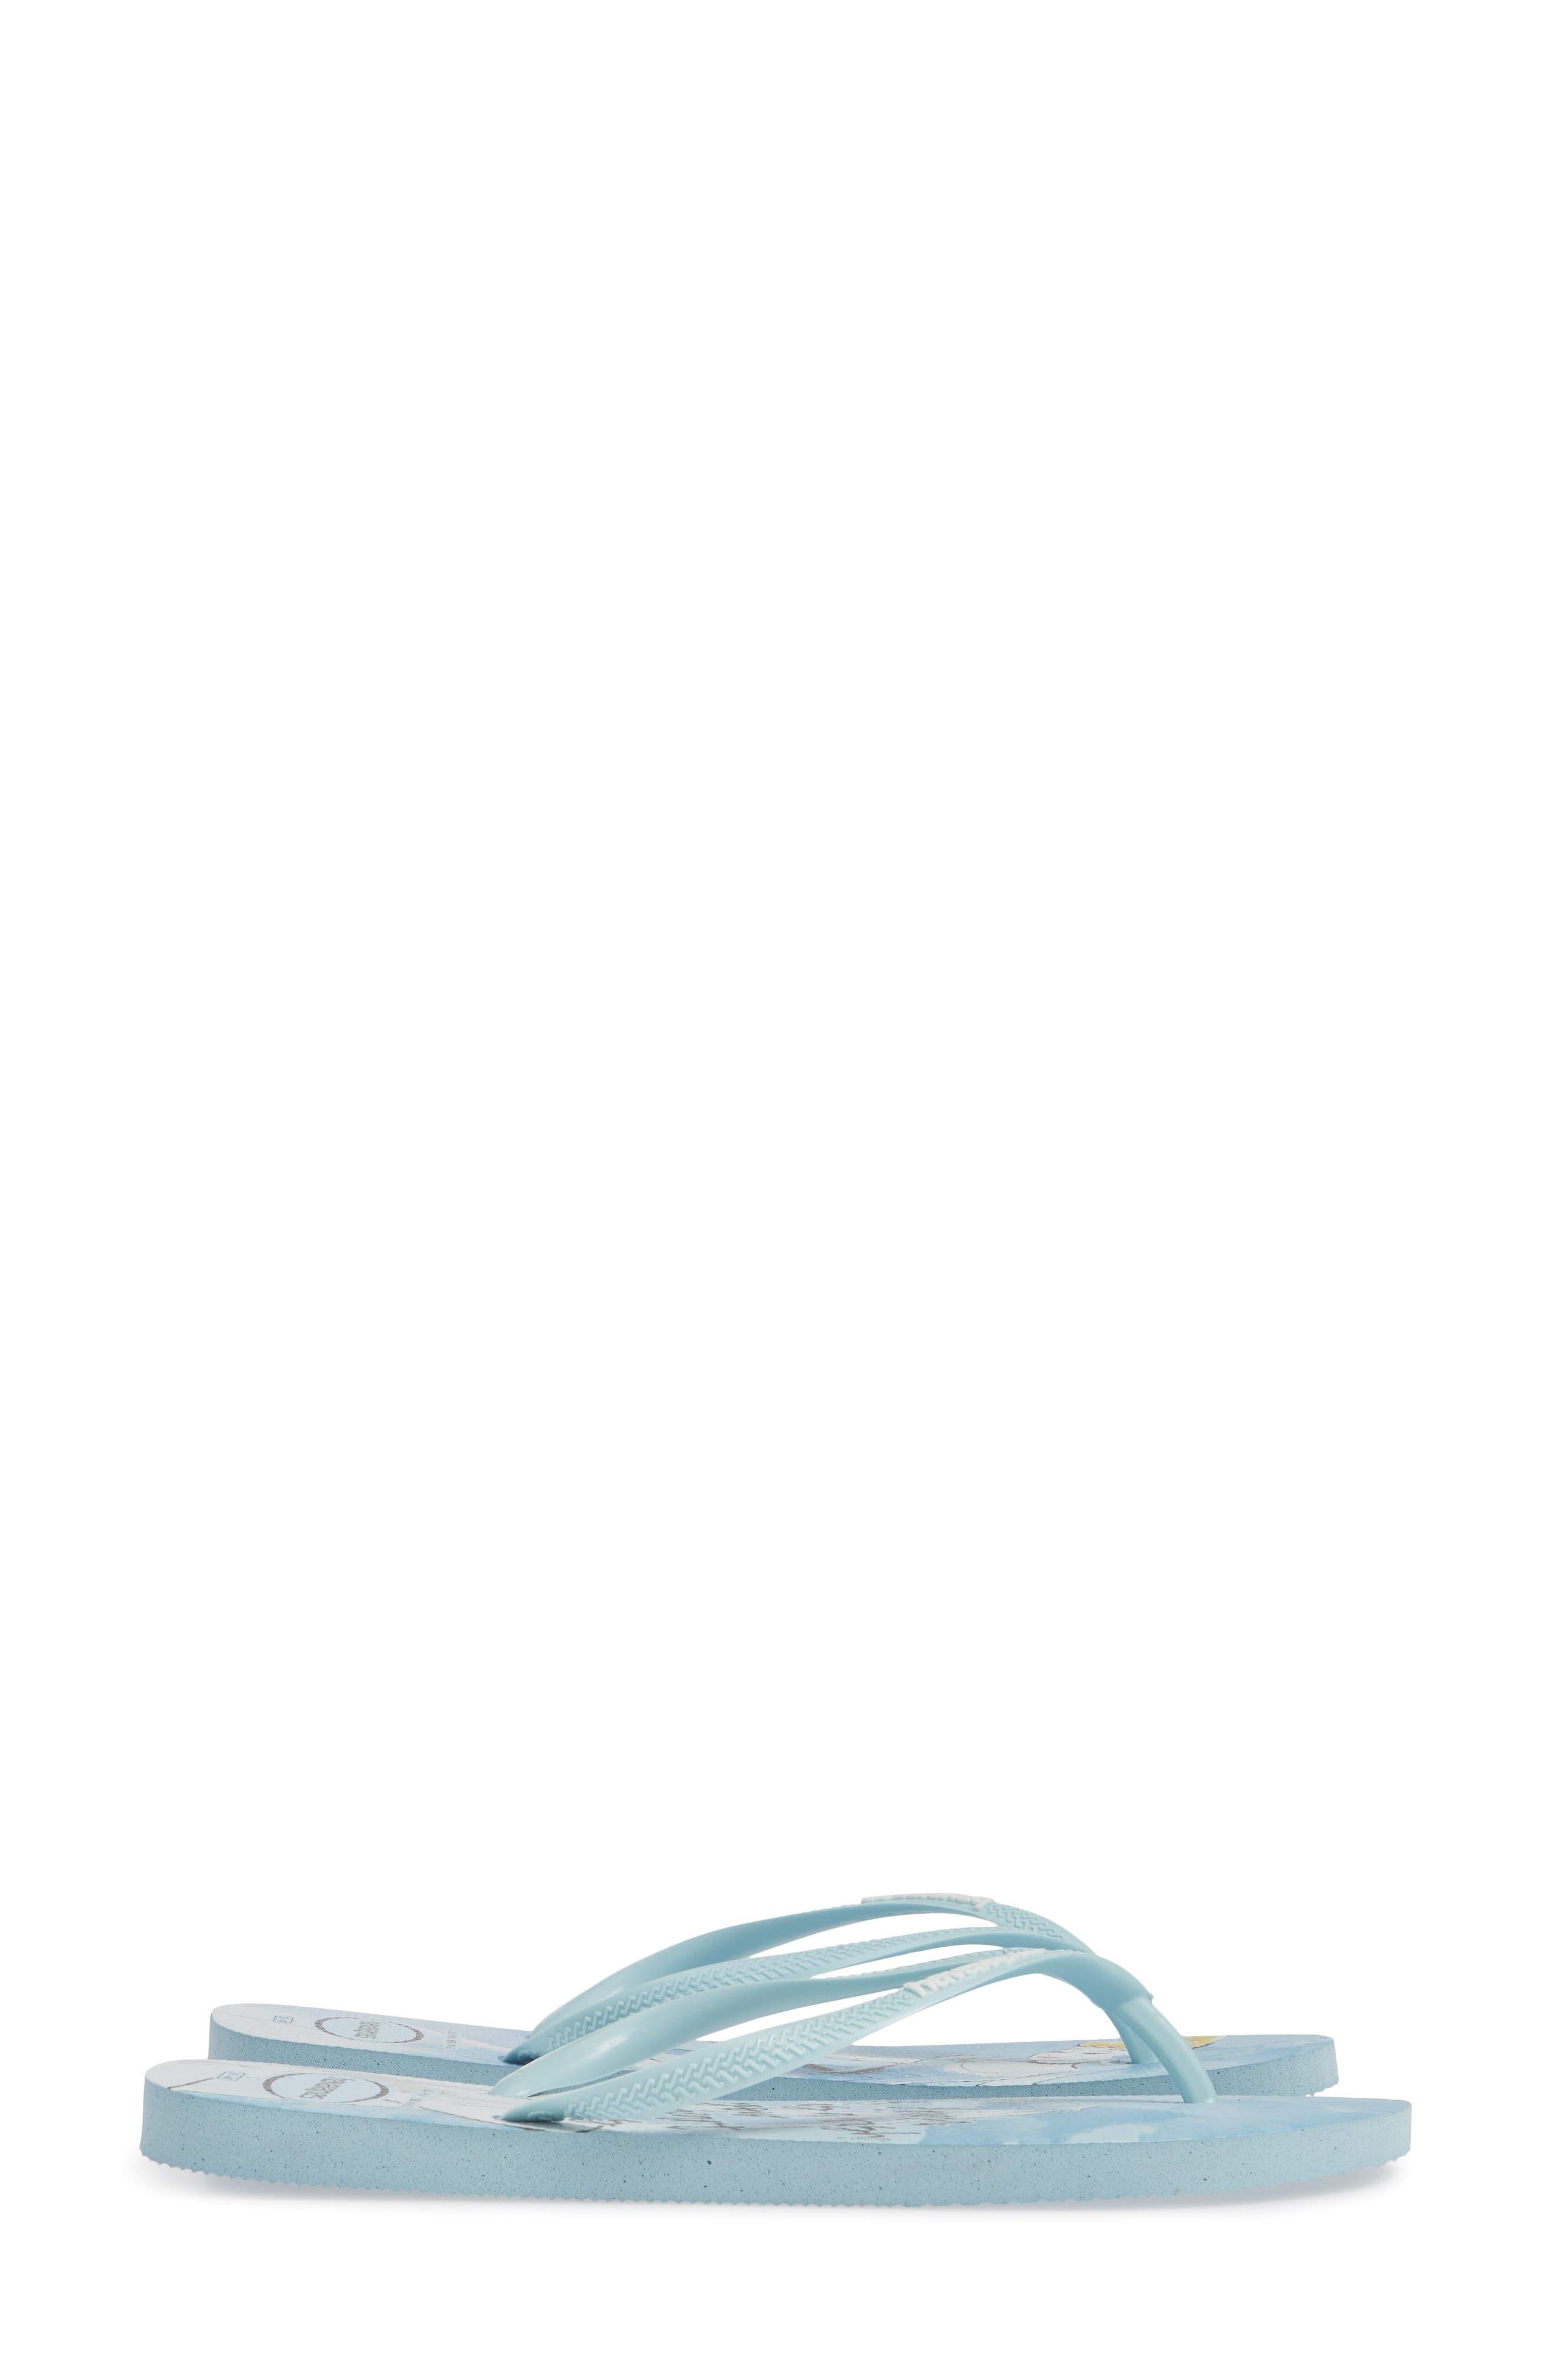 Havaiana Slim - Disney Princess Flip Flop,                             Alternate thumbnail 4, color,                             BLUE AQUA